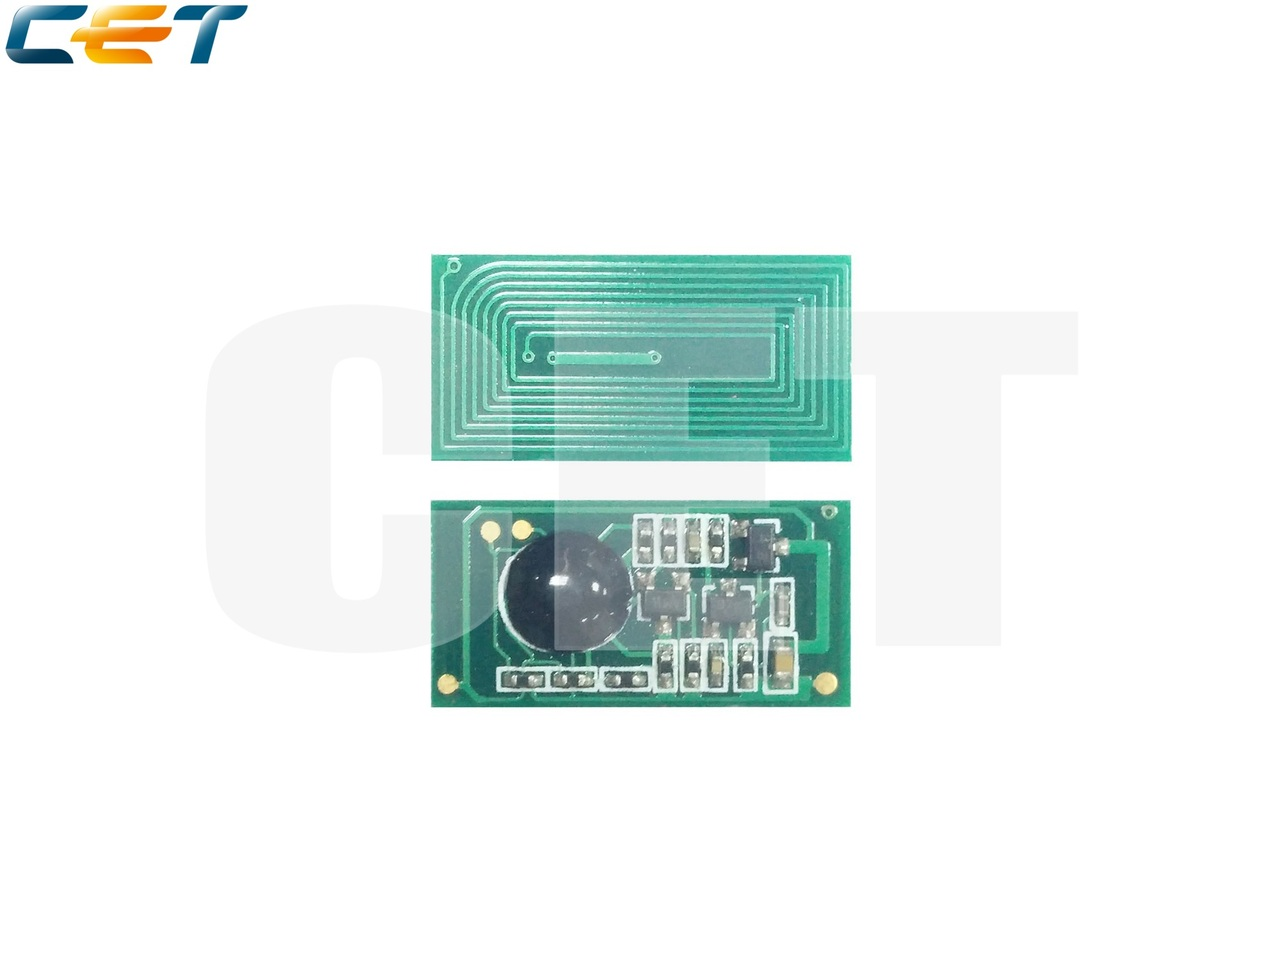 Чип картриджа для RICOH Aficio MPC2000/MPC2500/MPC3000(CET) Yellow, (WW), 15000 стр., CET9440Y